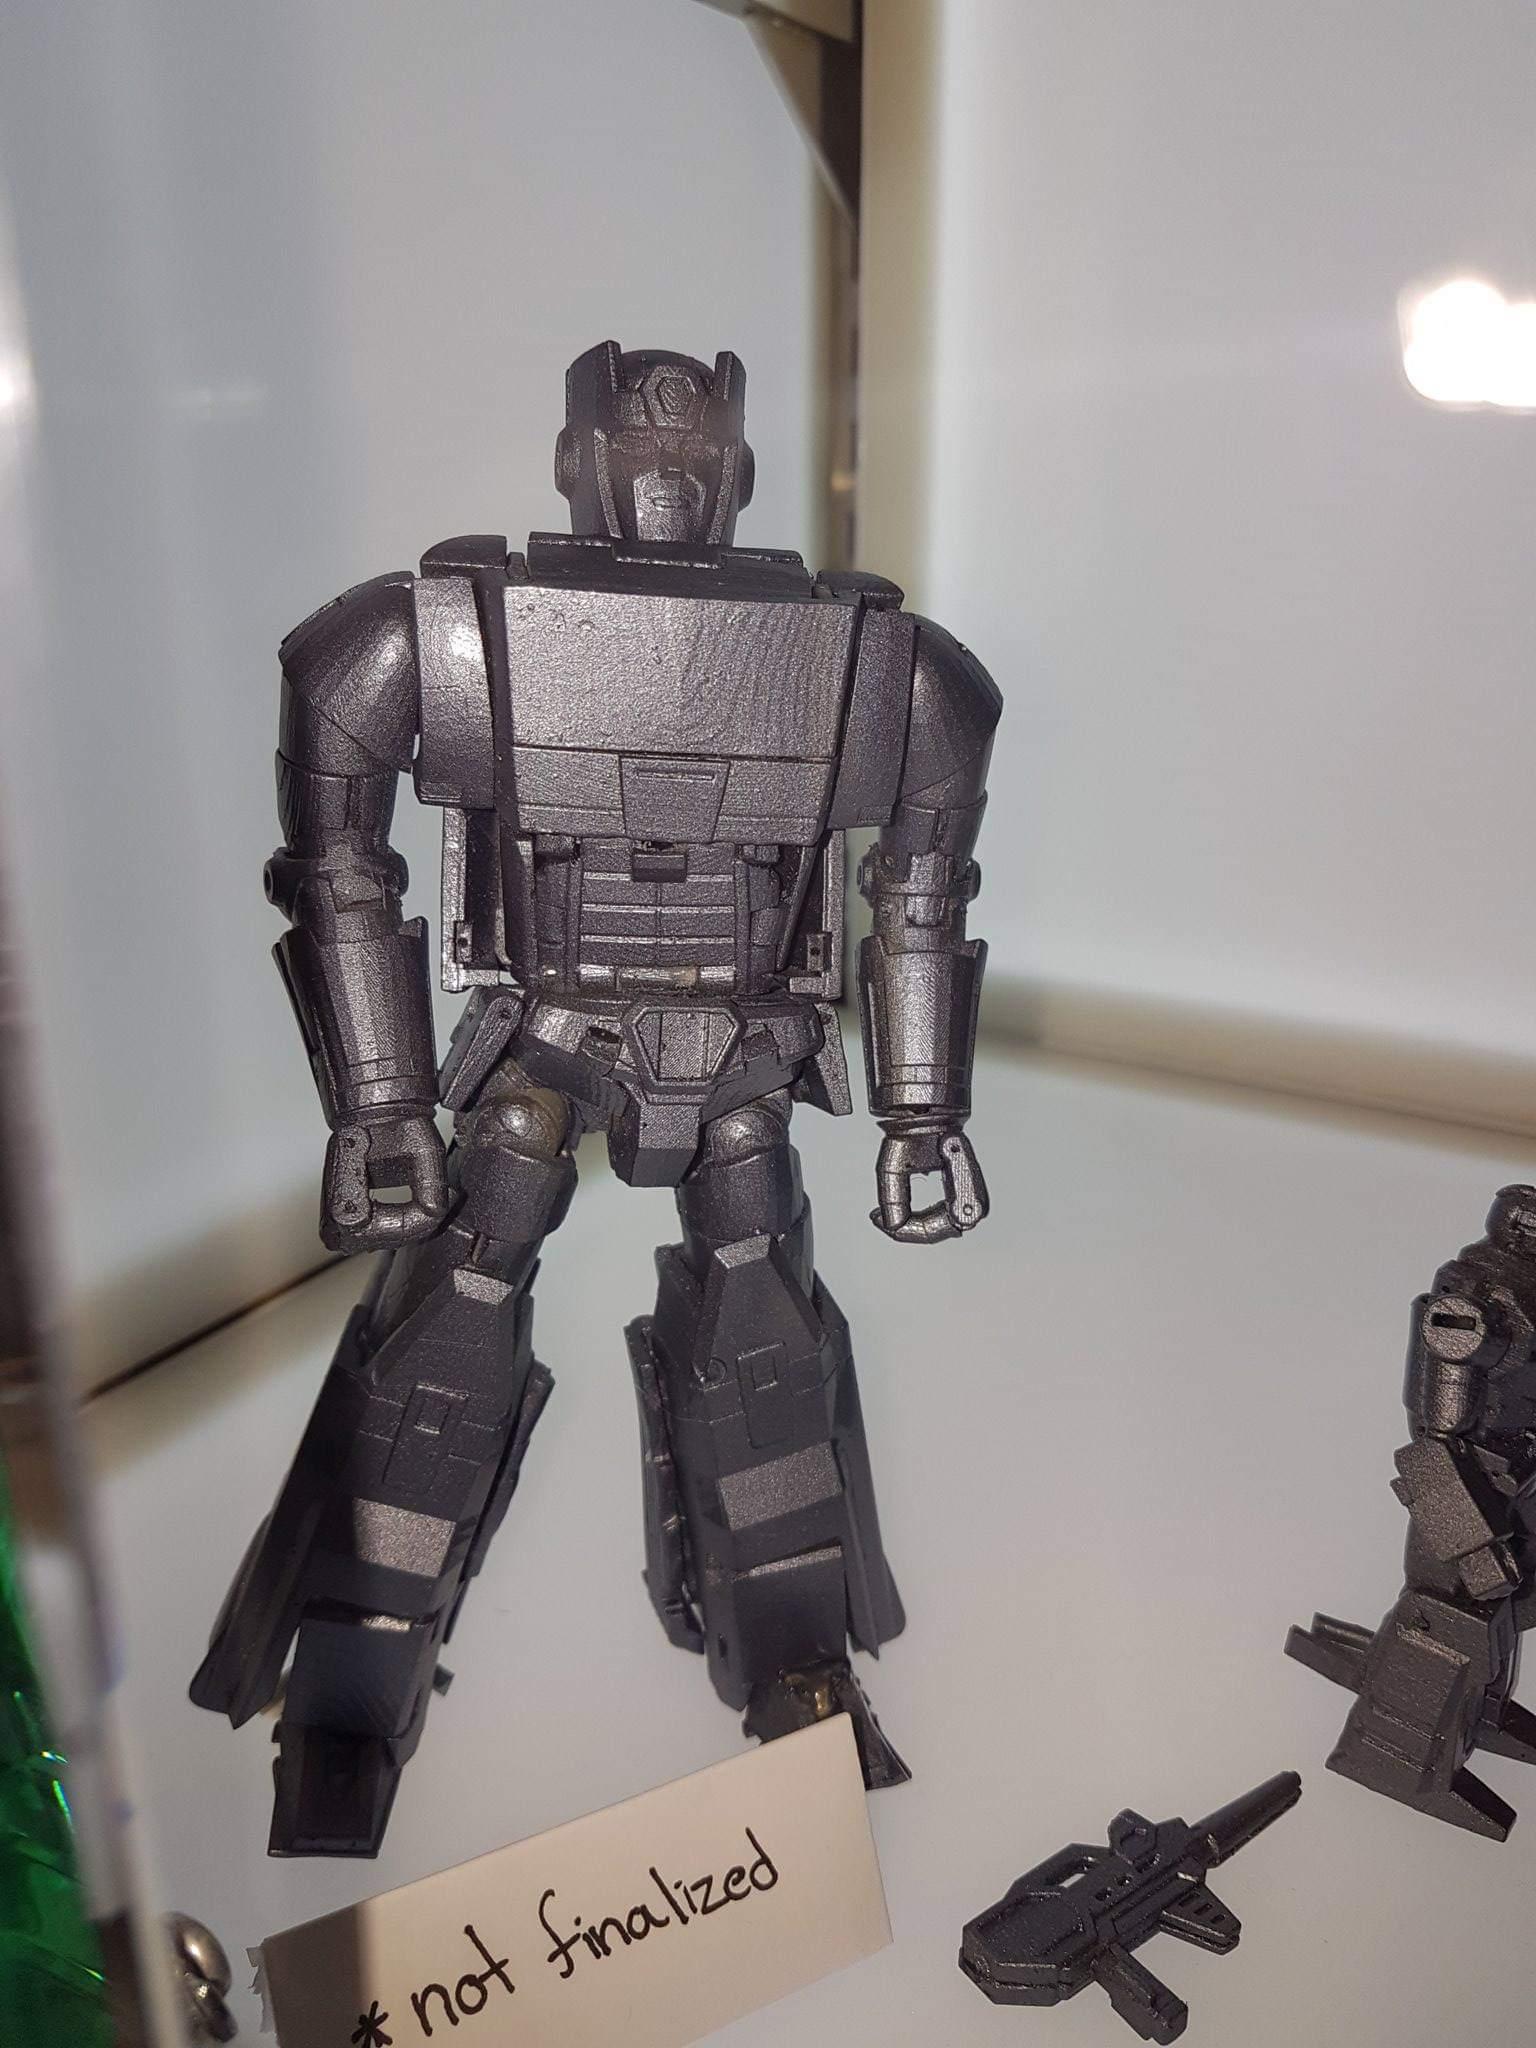 [X-Transbots] Produit Tiers - Jouets MX-11 Locke - aka Kup/Kaisso CcxMTxQA_o